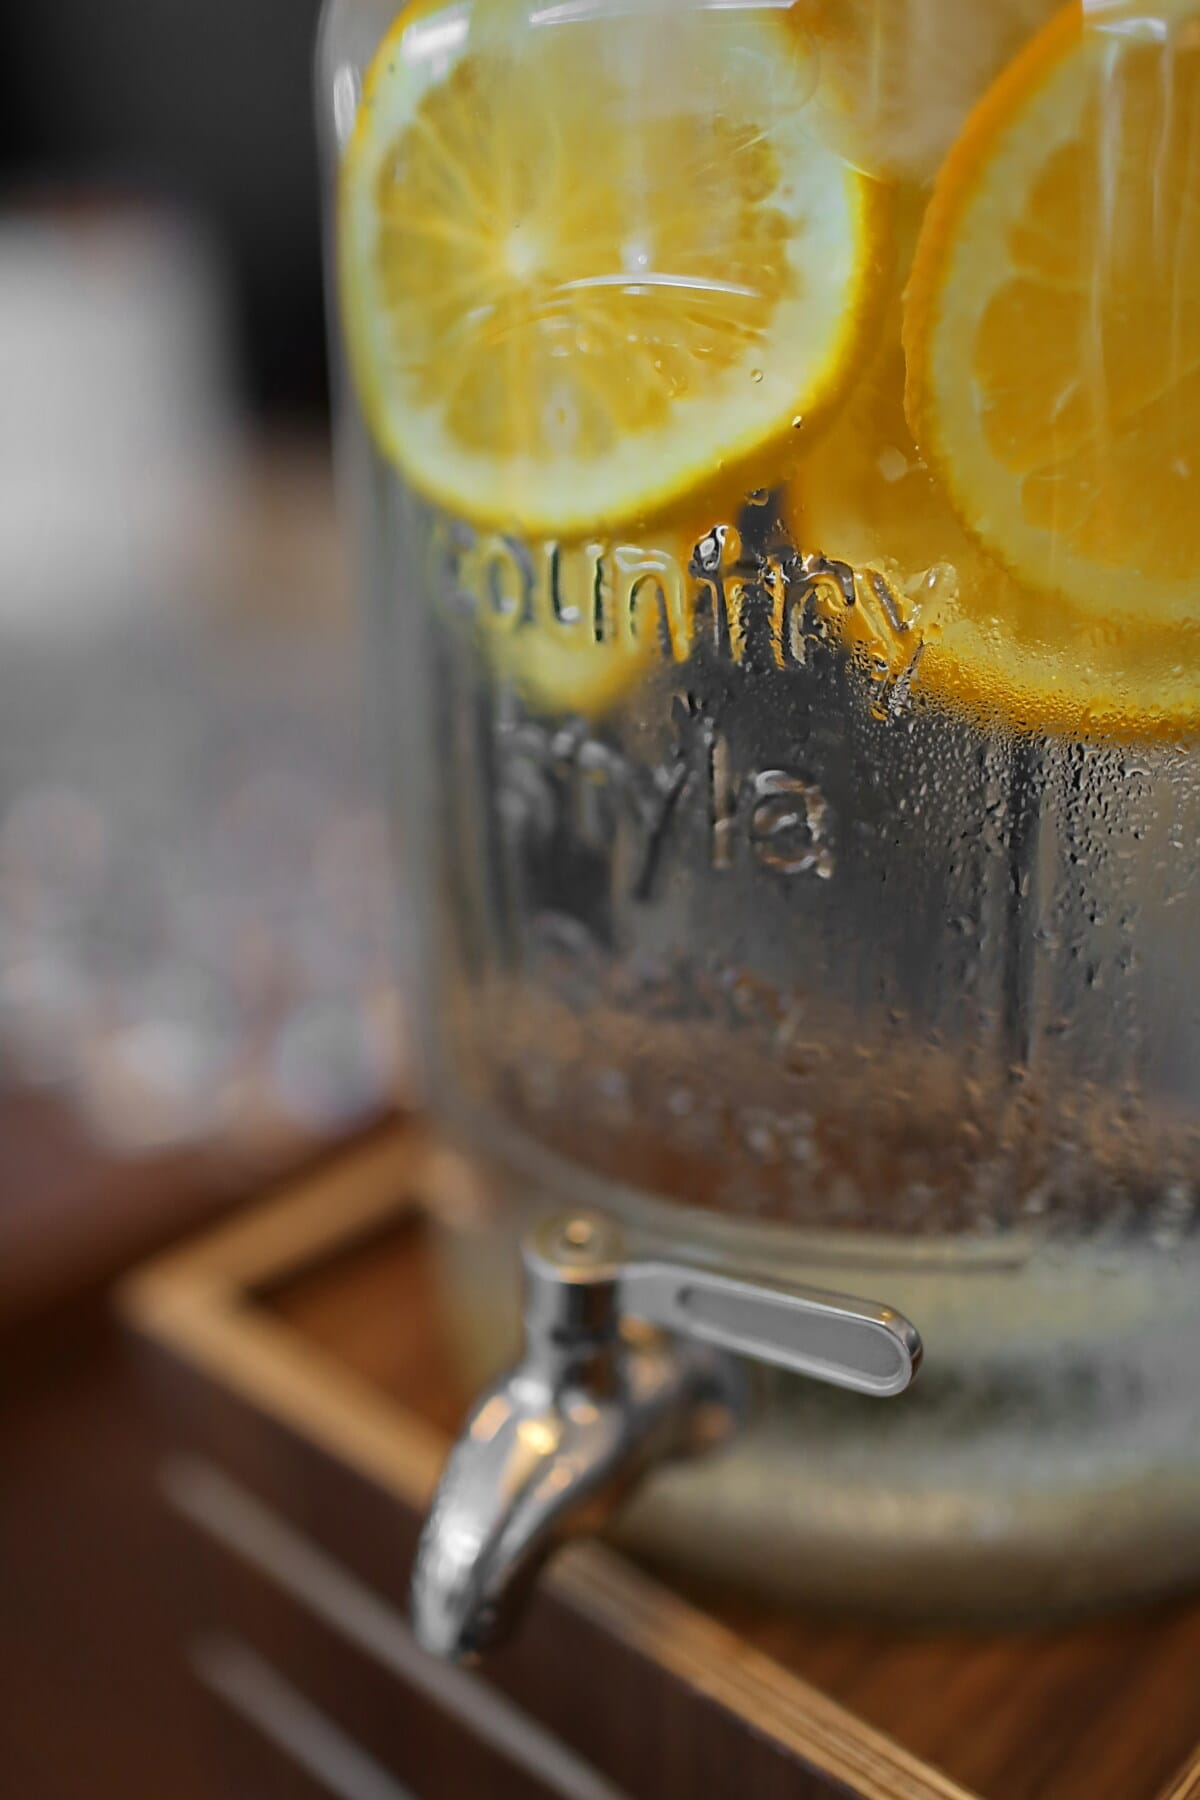 lemonade, cold water, drinking water, fruit cocktail, fresh, moisture, glass, drink, indoors, wet